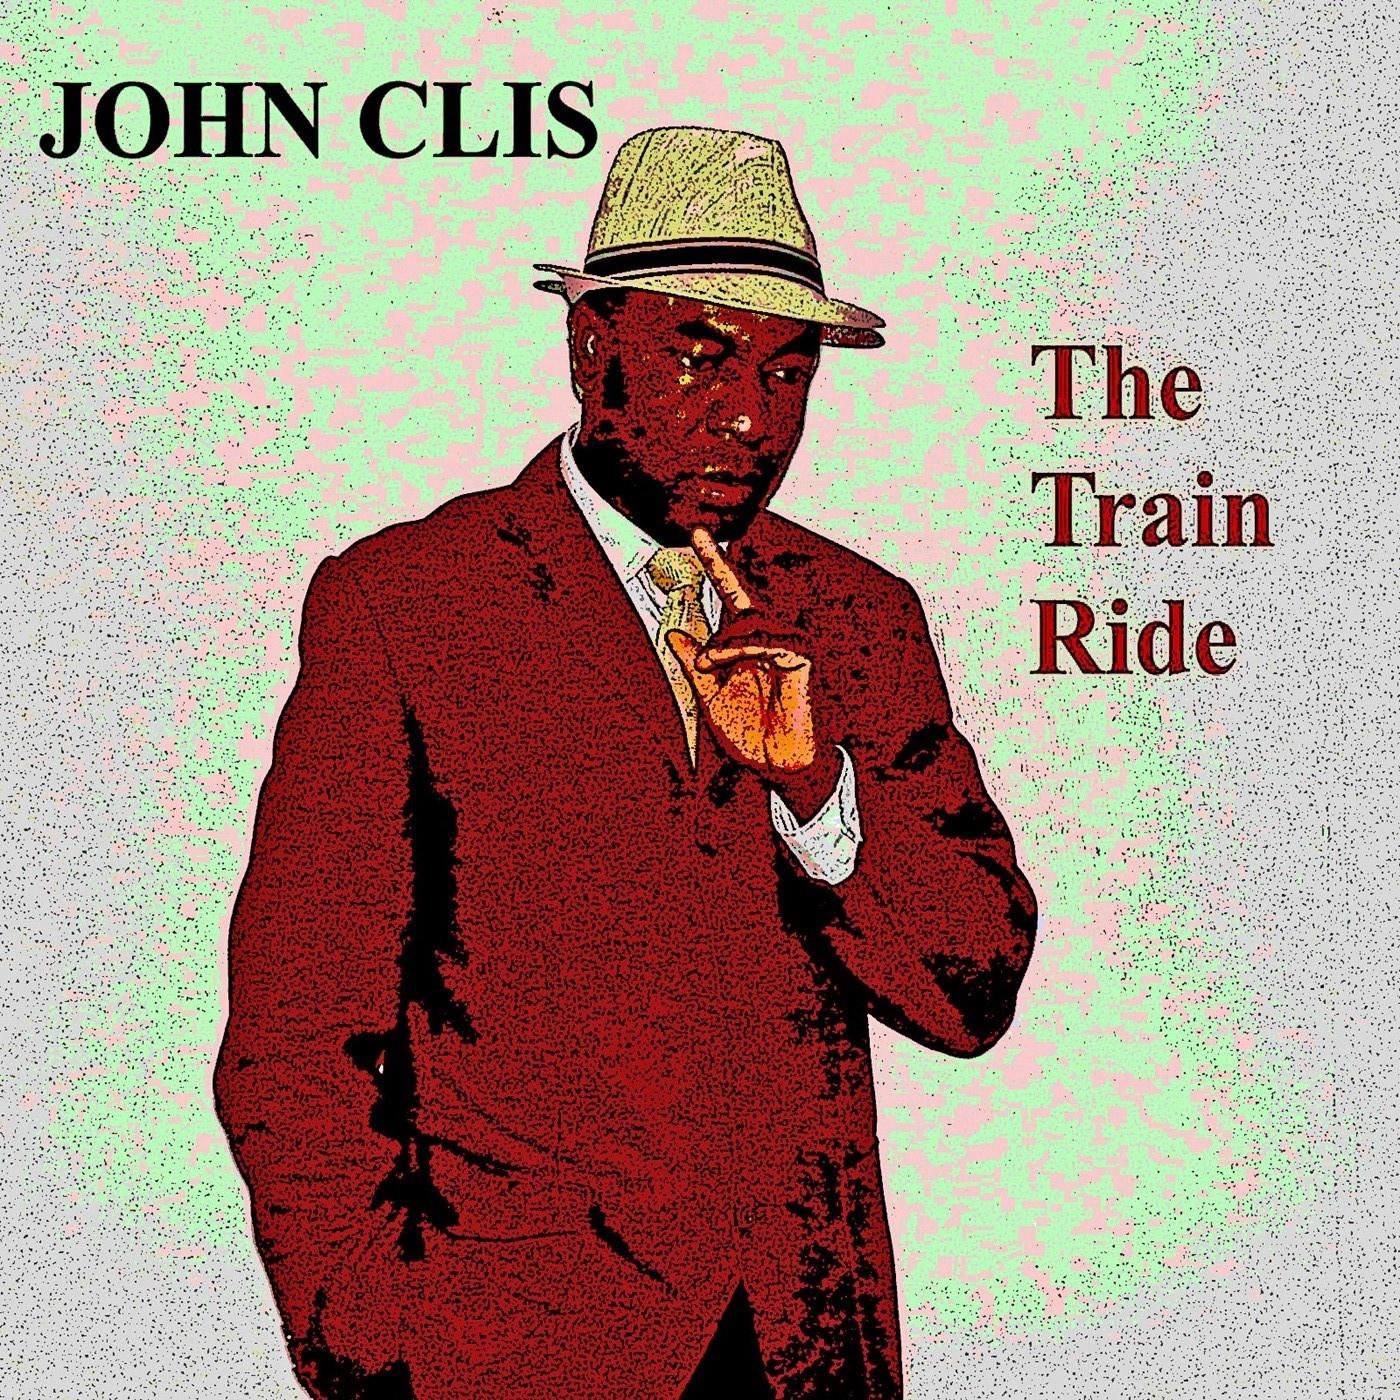 https://0201.nccdn.net/1_2/000/000/090/073/JOHN-CLIS-1ST-CD-1400x1400.jpg